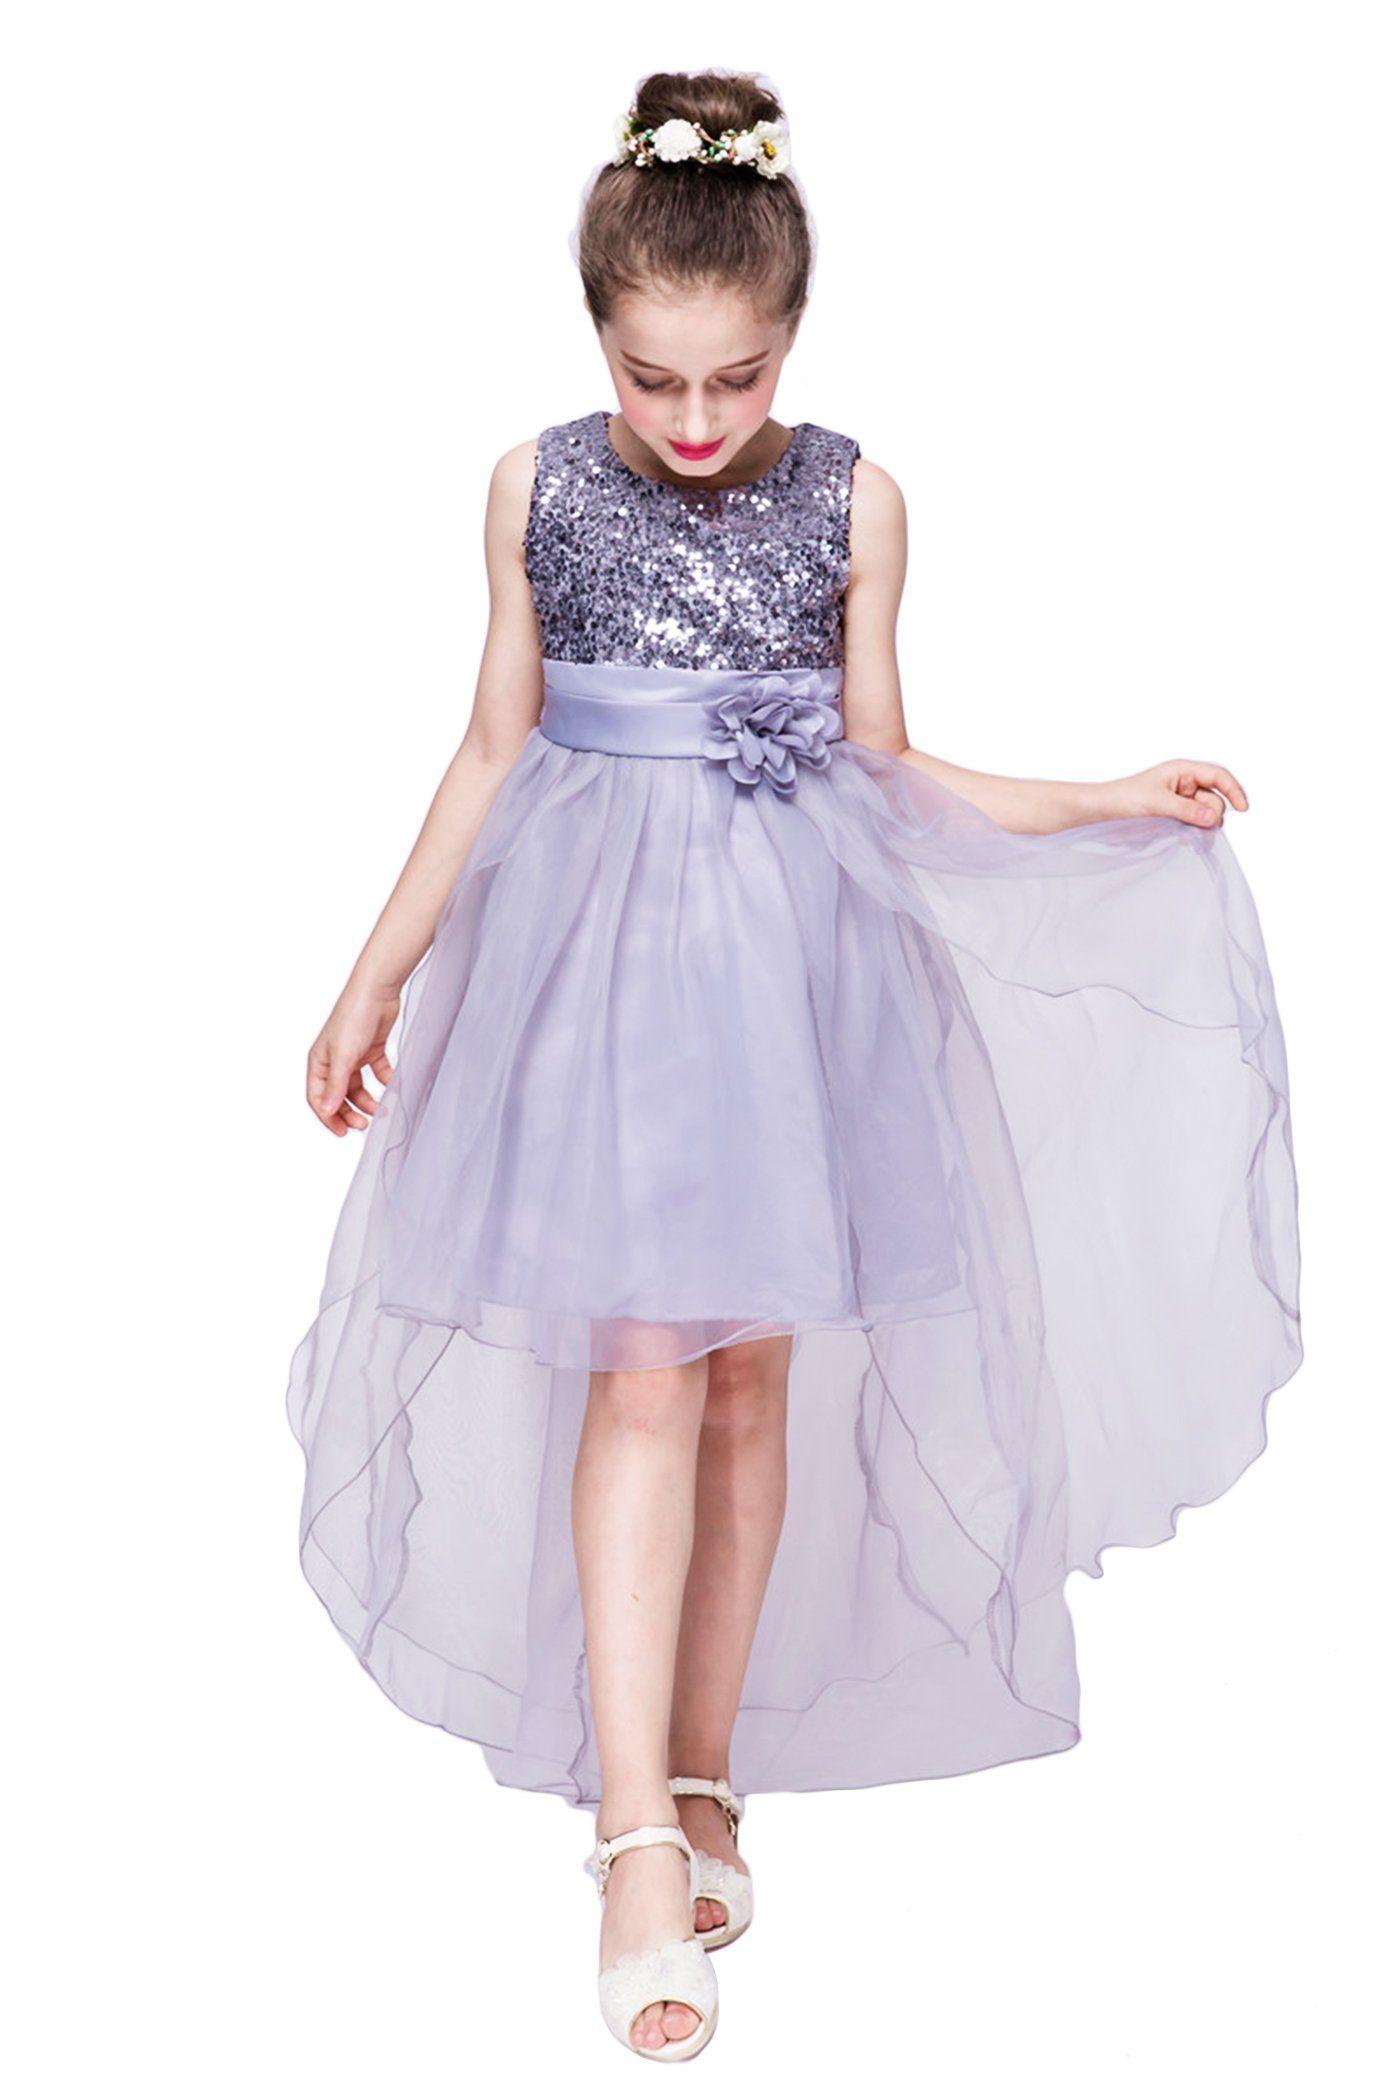 YMING Girls Sequin Dress Mesh Party High Low Wedding Princess Gray ...